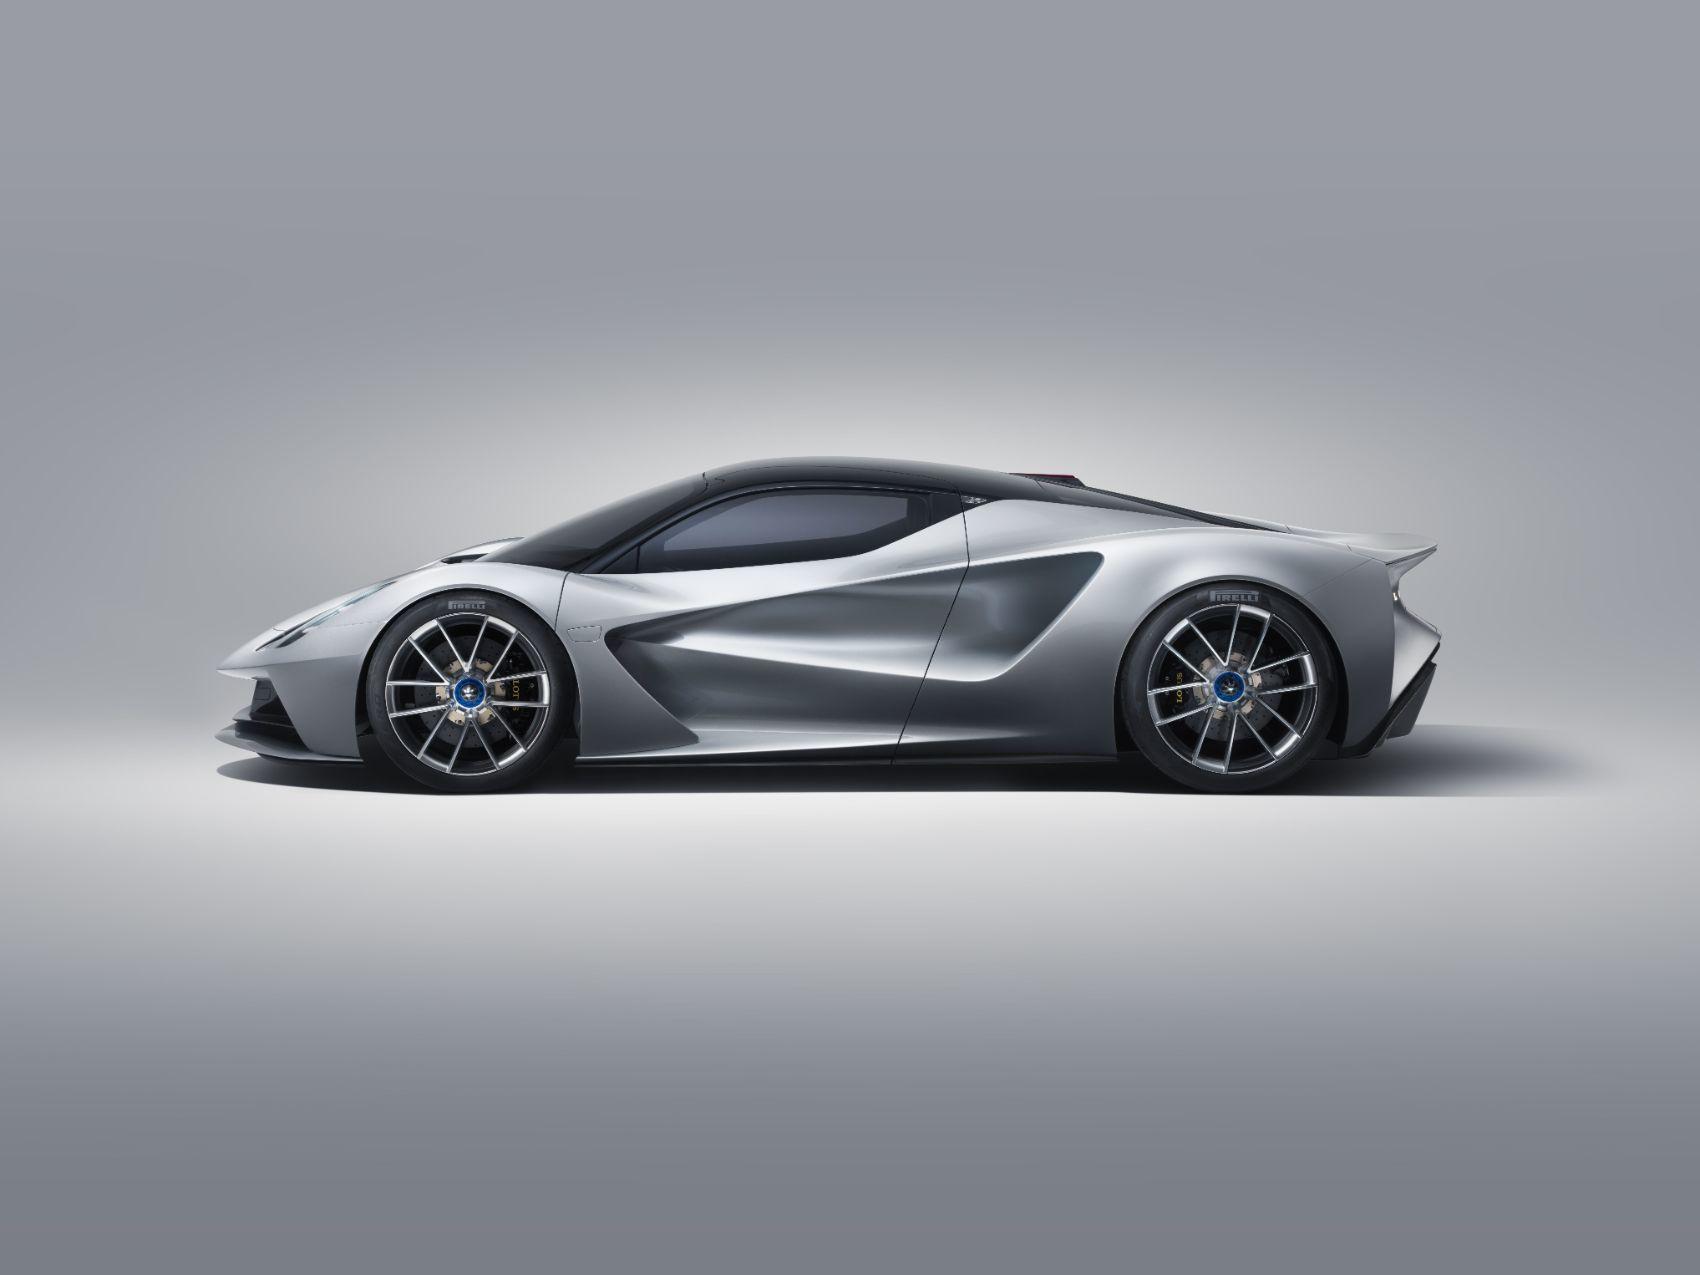 Lotus Evija configurator helps buyers design their dream Evija.